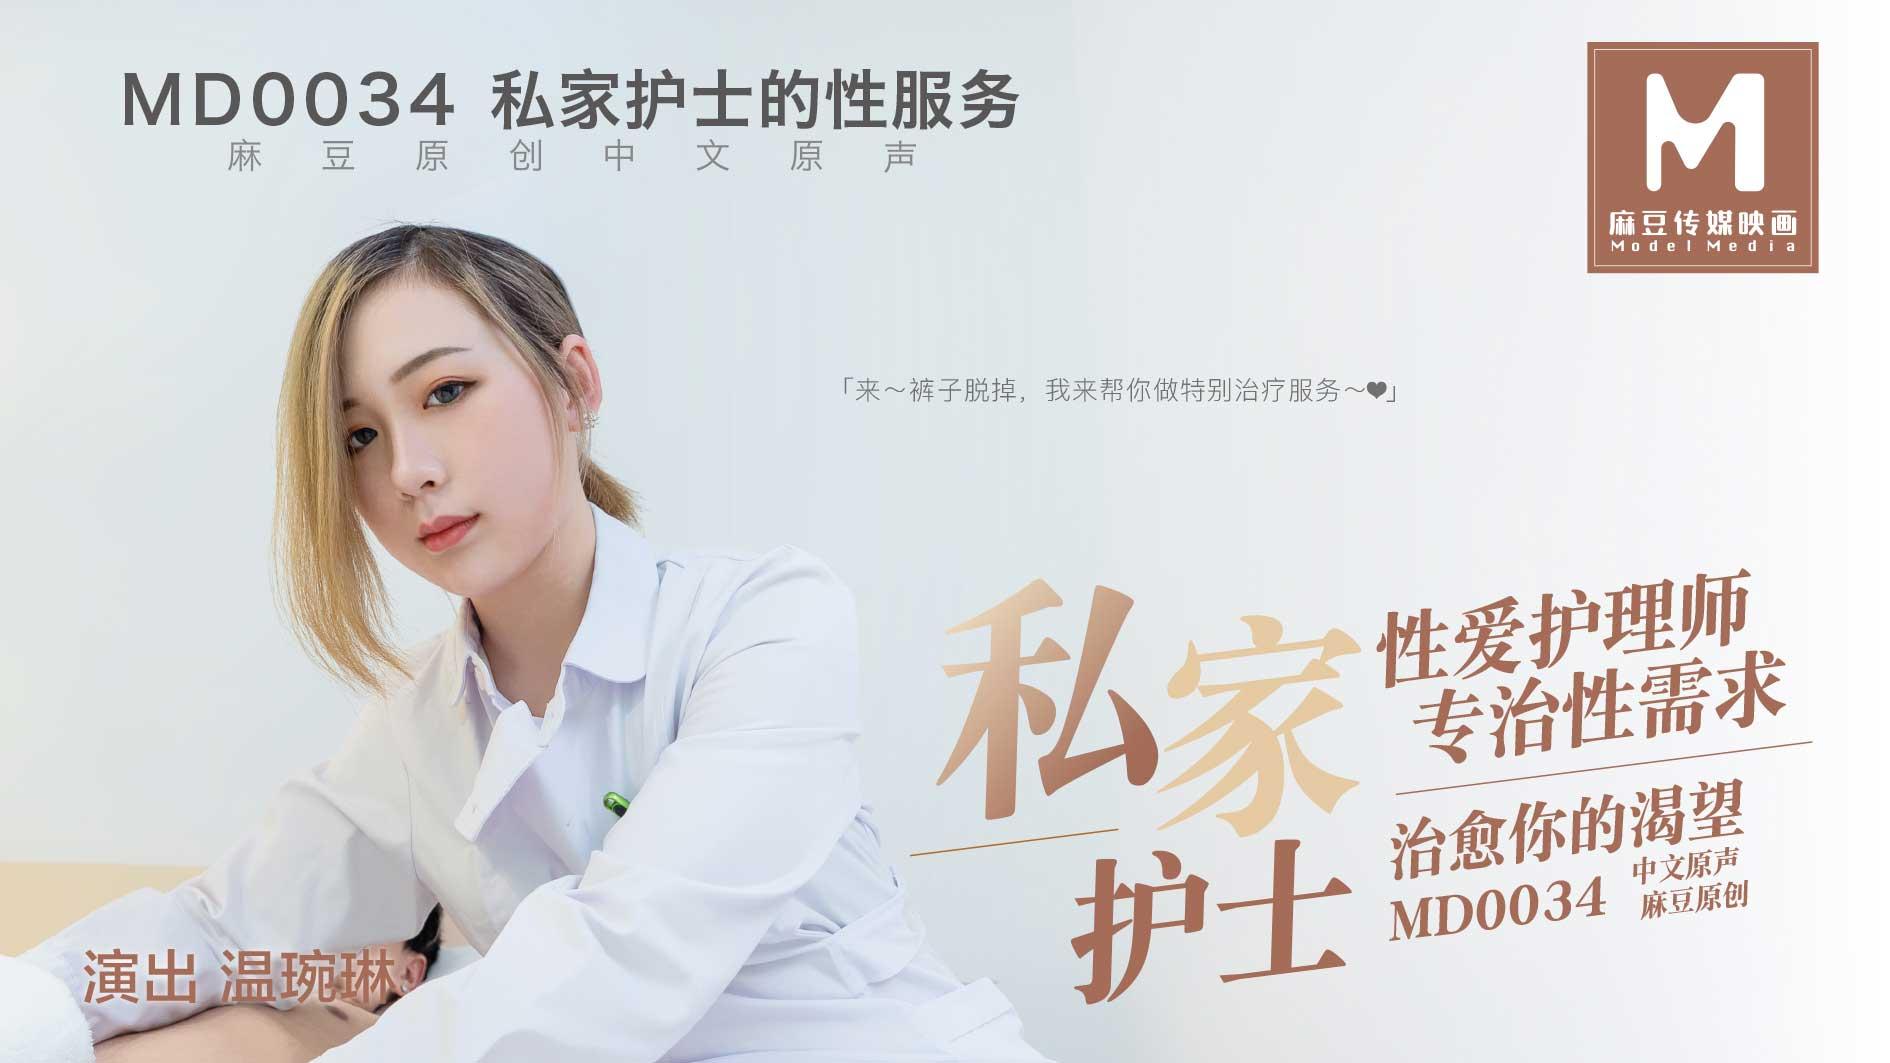 MD0034私家护士的性服务